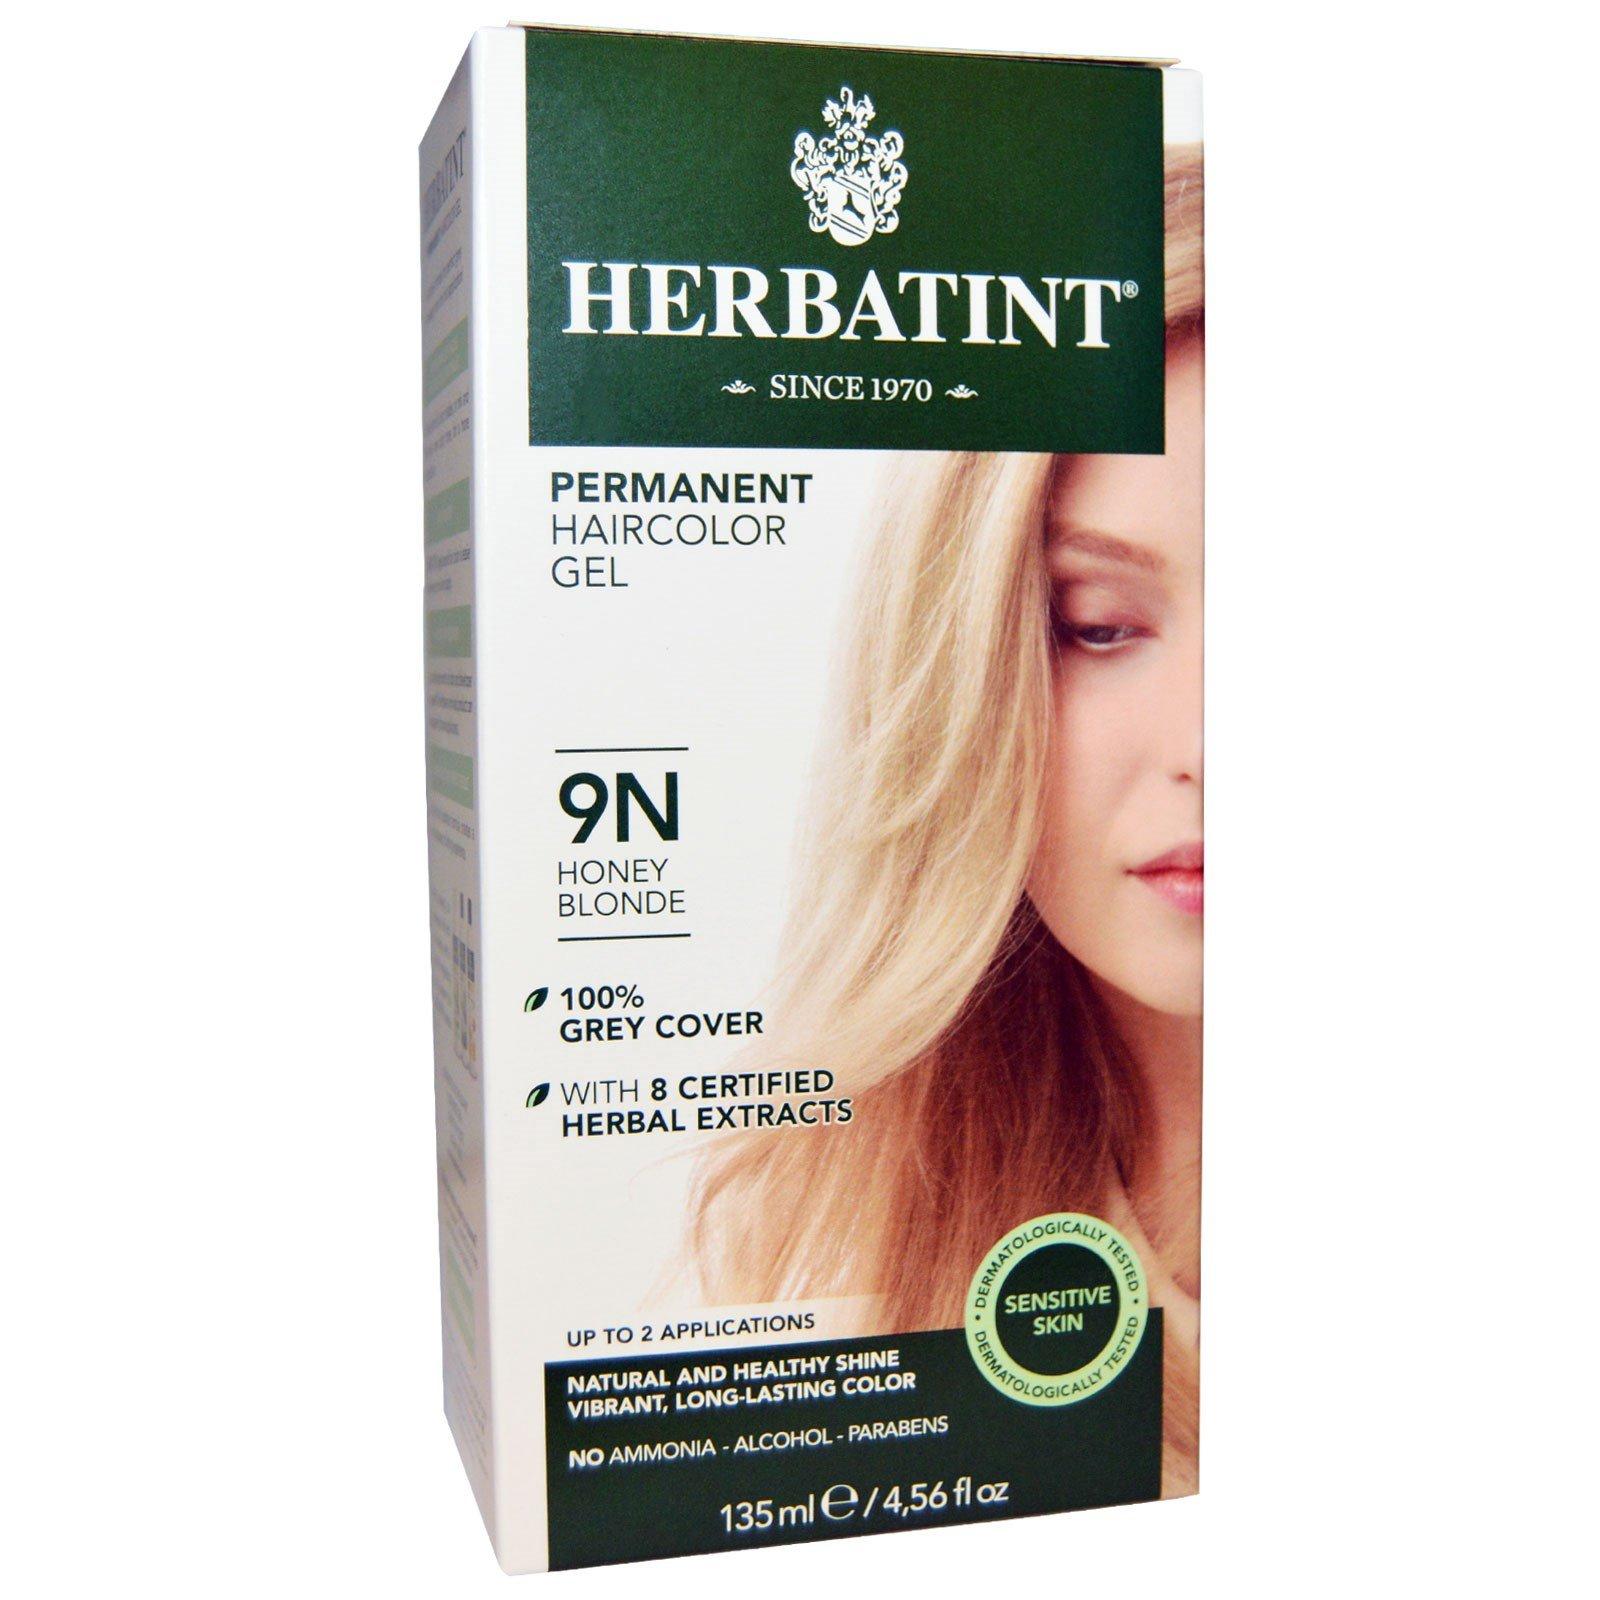 Herbatint, Permanent Haircolor Gel, 9N, Honey Blonde, 4.56 fl oz (135 ml) - 2pc